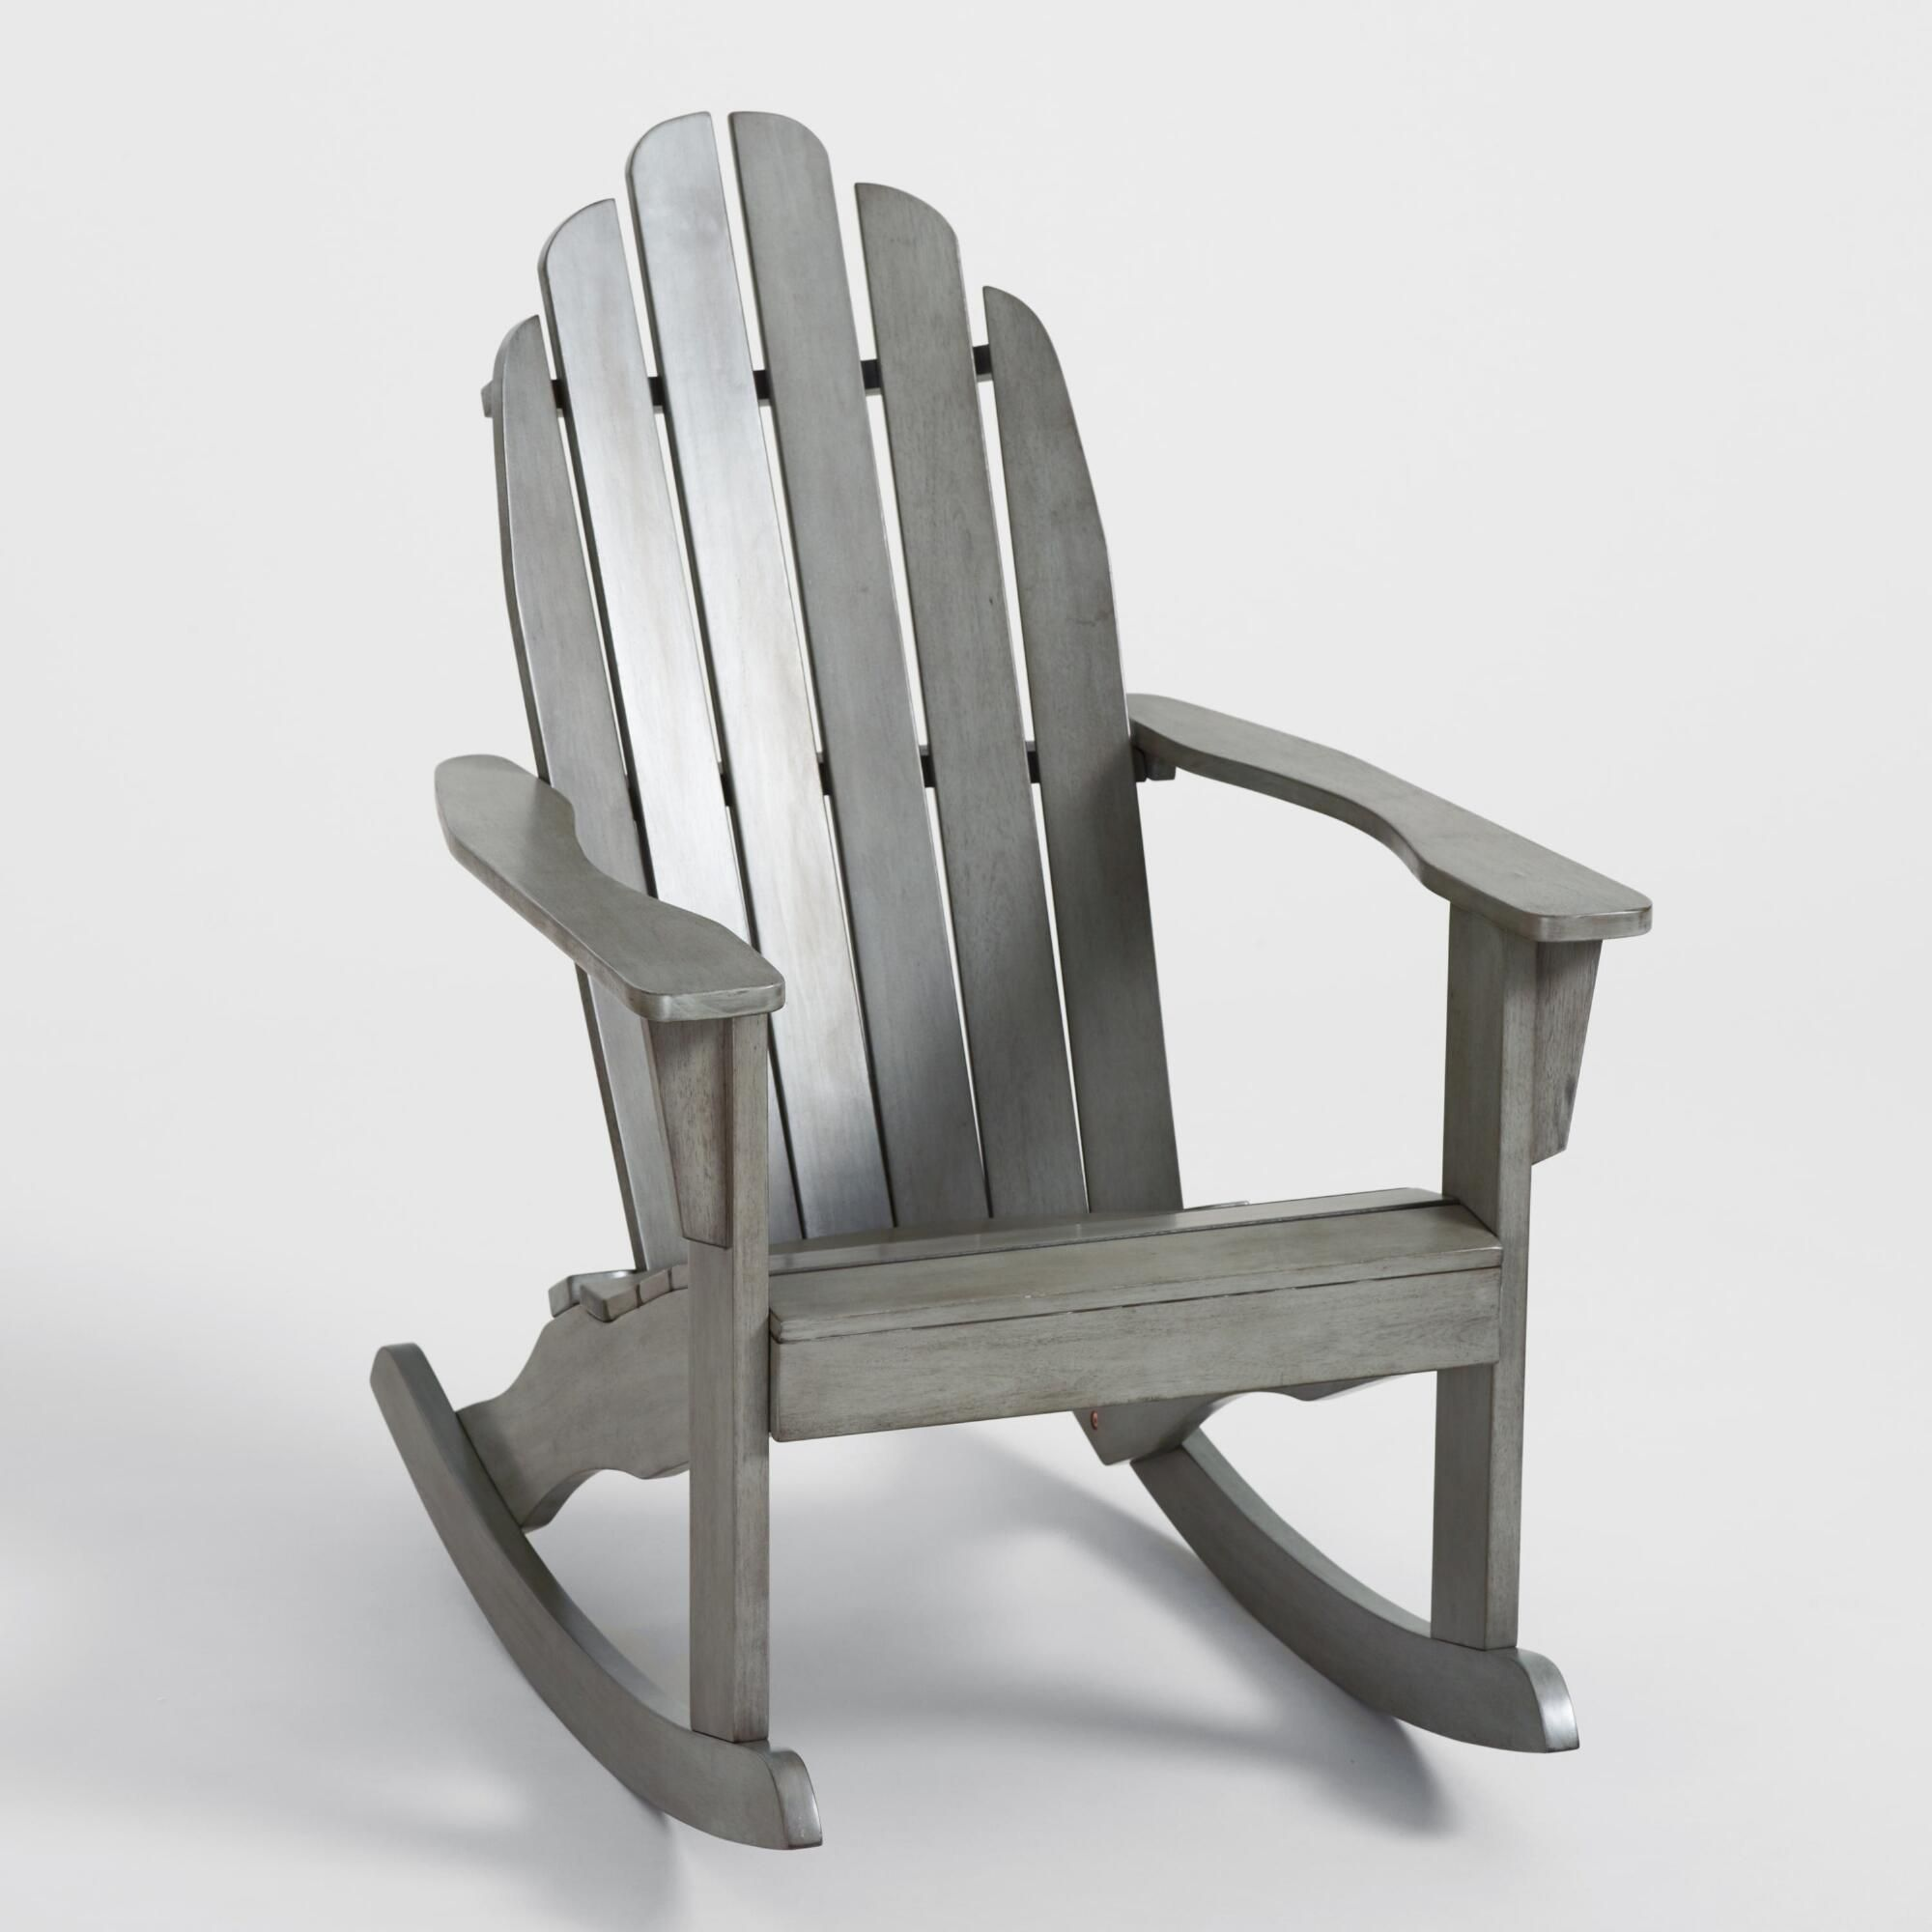 Gray Adirondack Rocking Chair By World Market In 2020 Adirondack